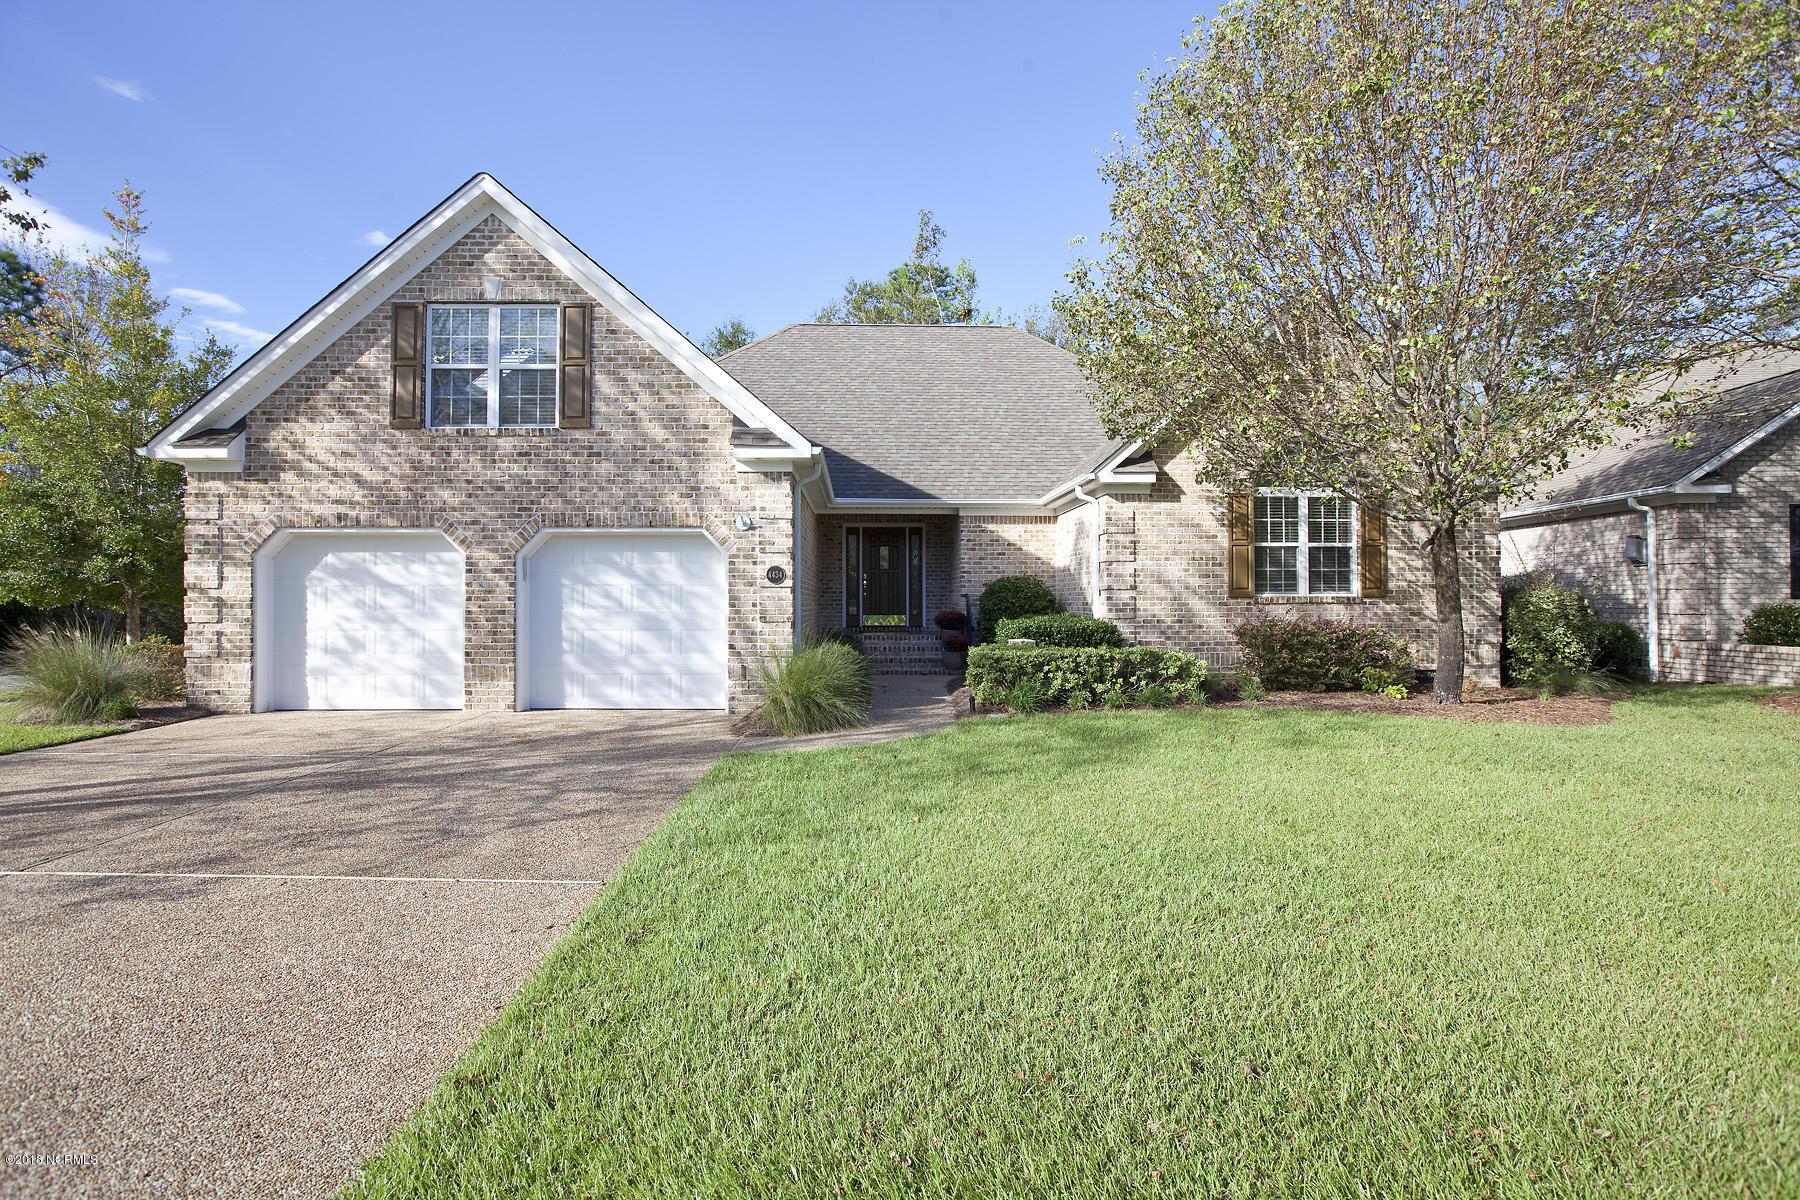 4434 Grey Oaks Court- Wilmington- North Carolina 28412, 4 Bedrooms Bedrooms, 8 Rooms Rooms,3 BathroomsBathrooms,Residential,For Sale,Grey Oaks,100137253